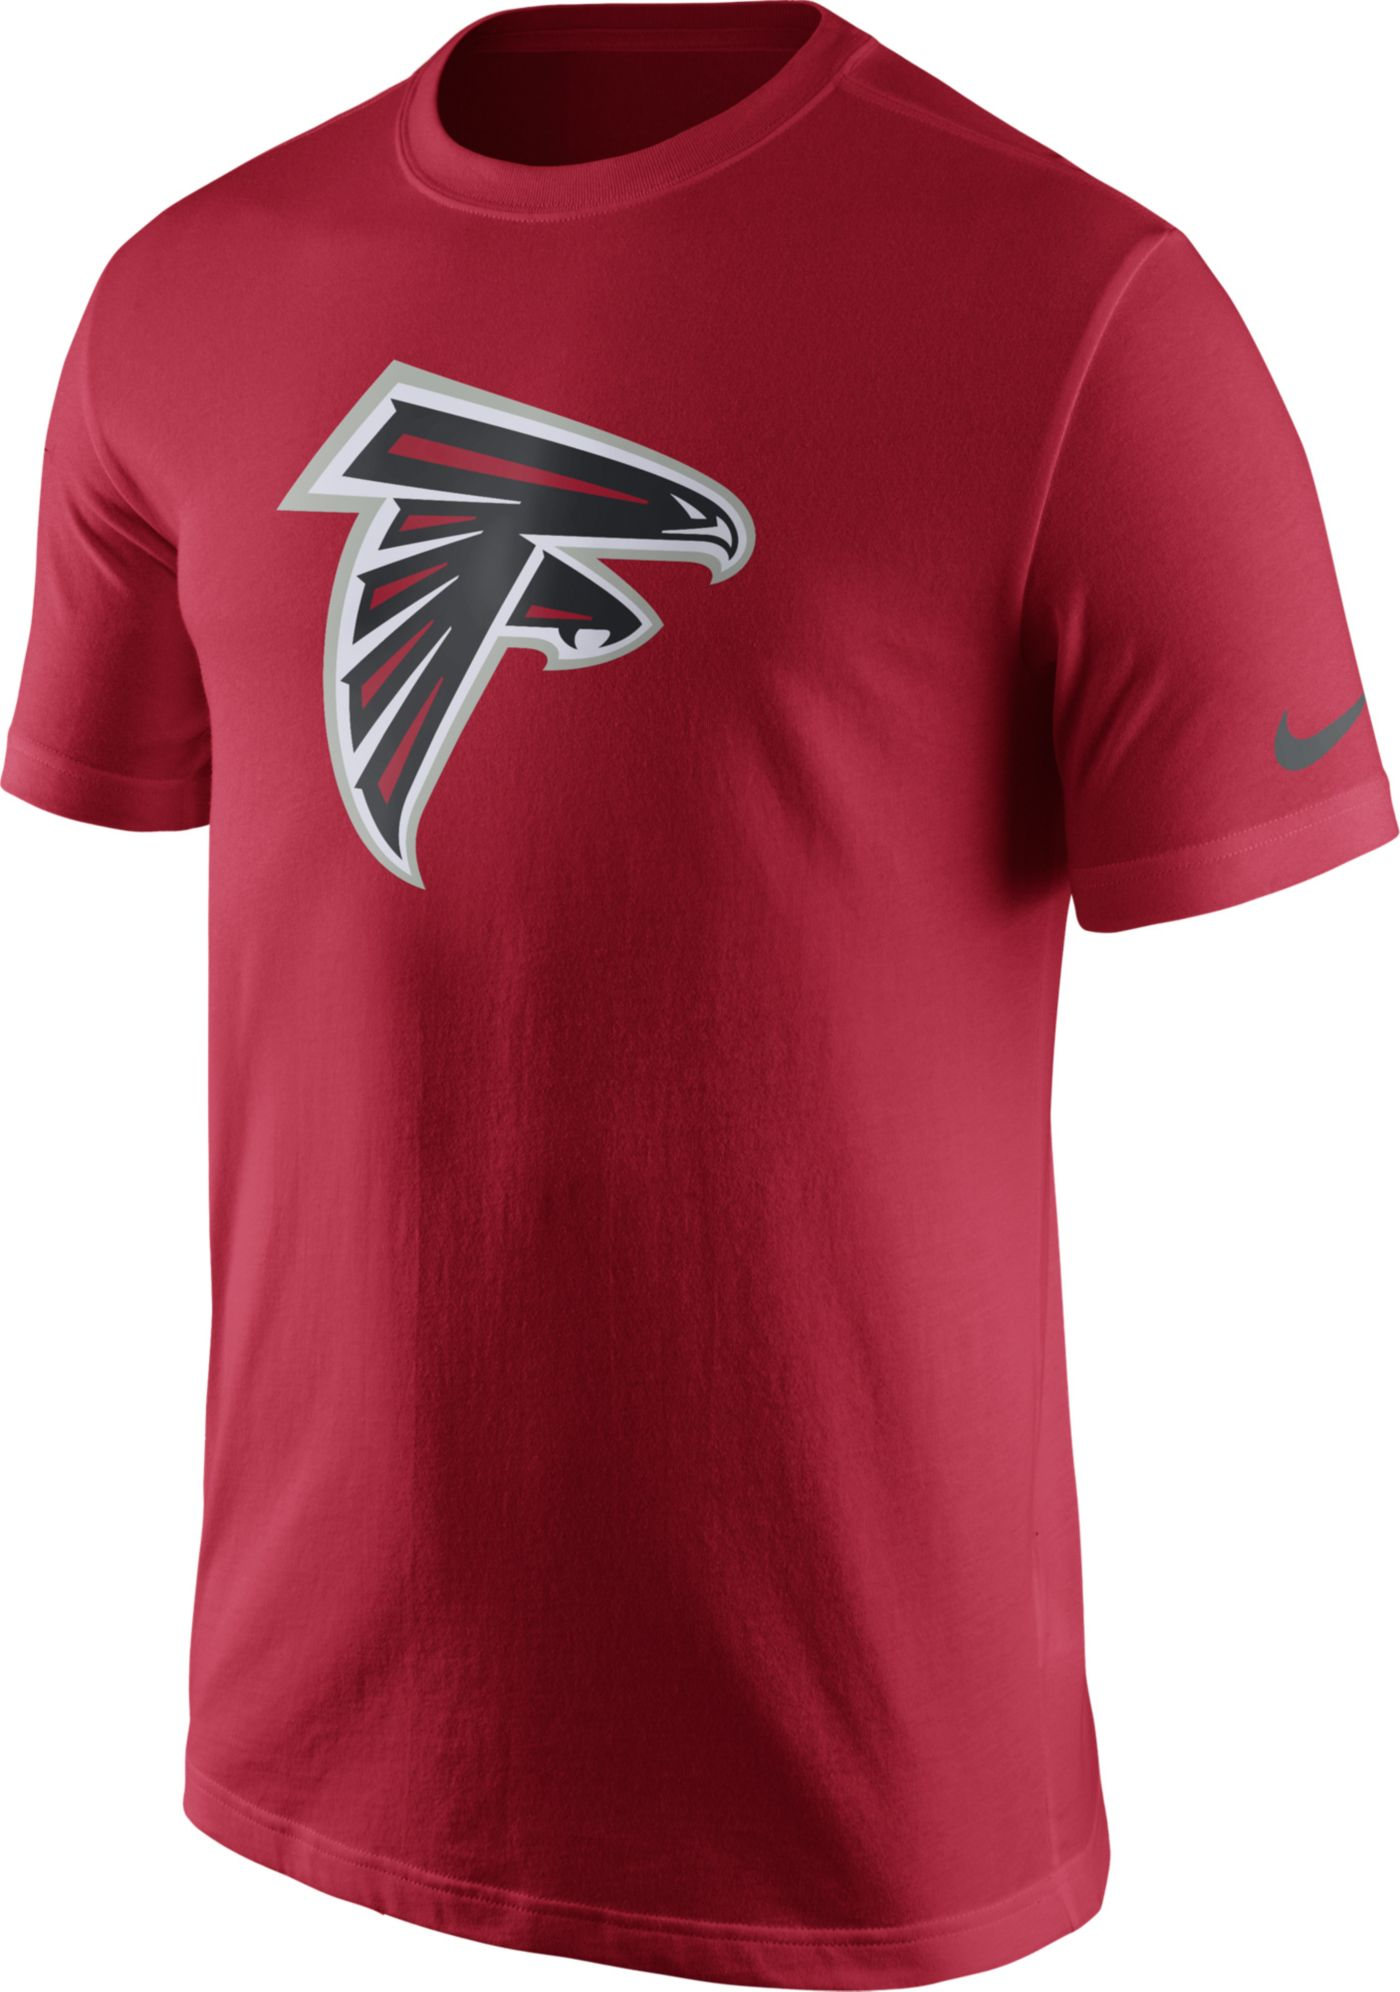 Nike Men's Atlanta Falcons Essential Logo Red T-Shirt